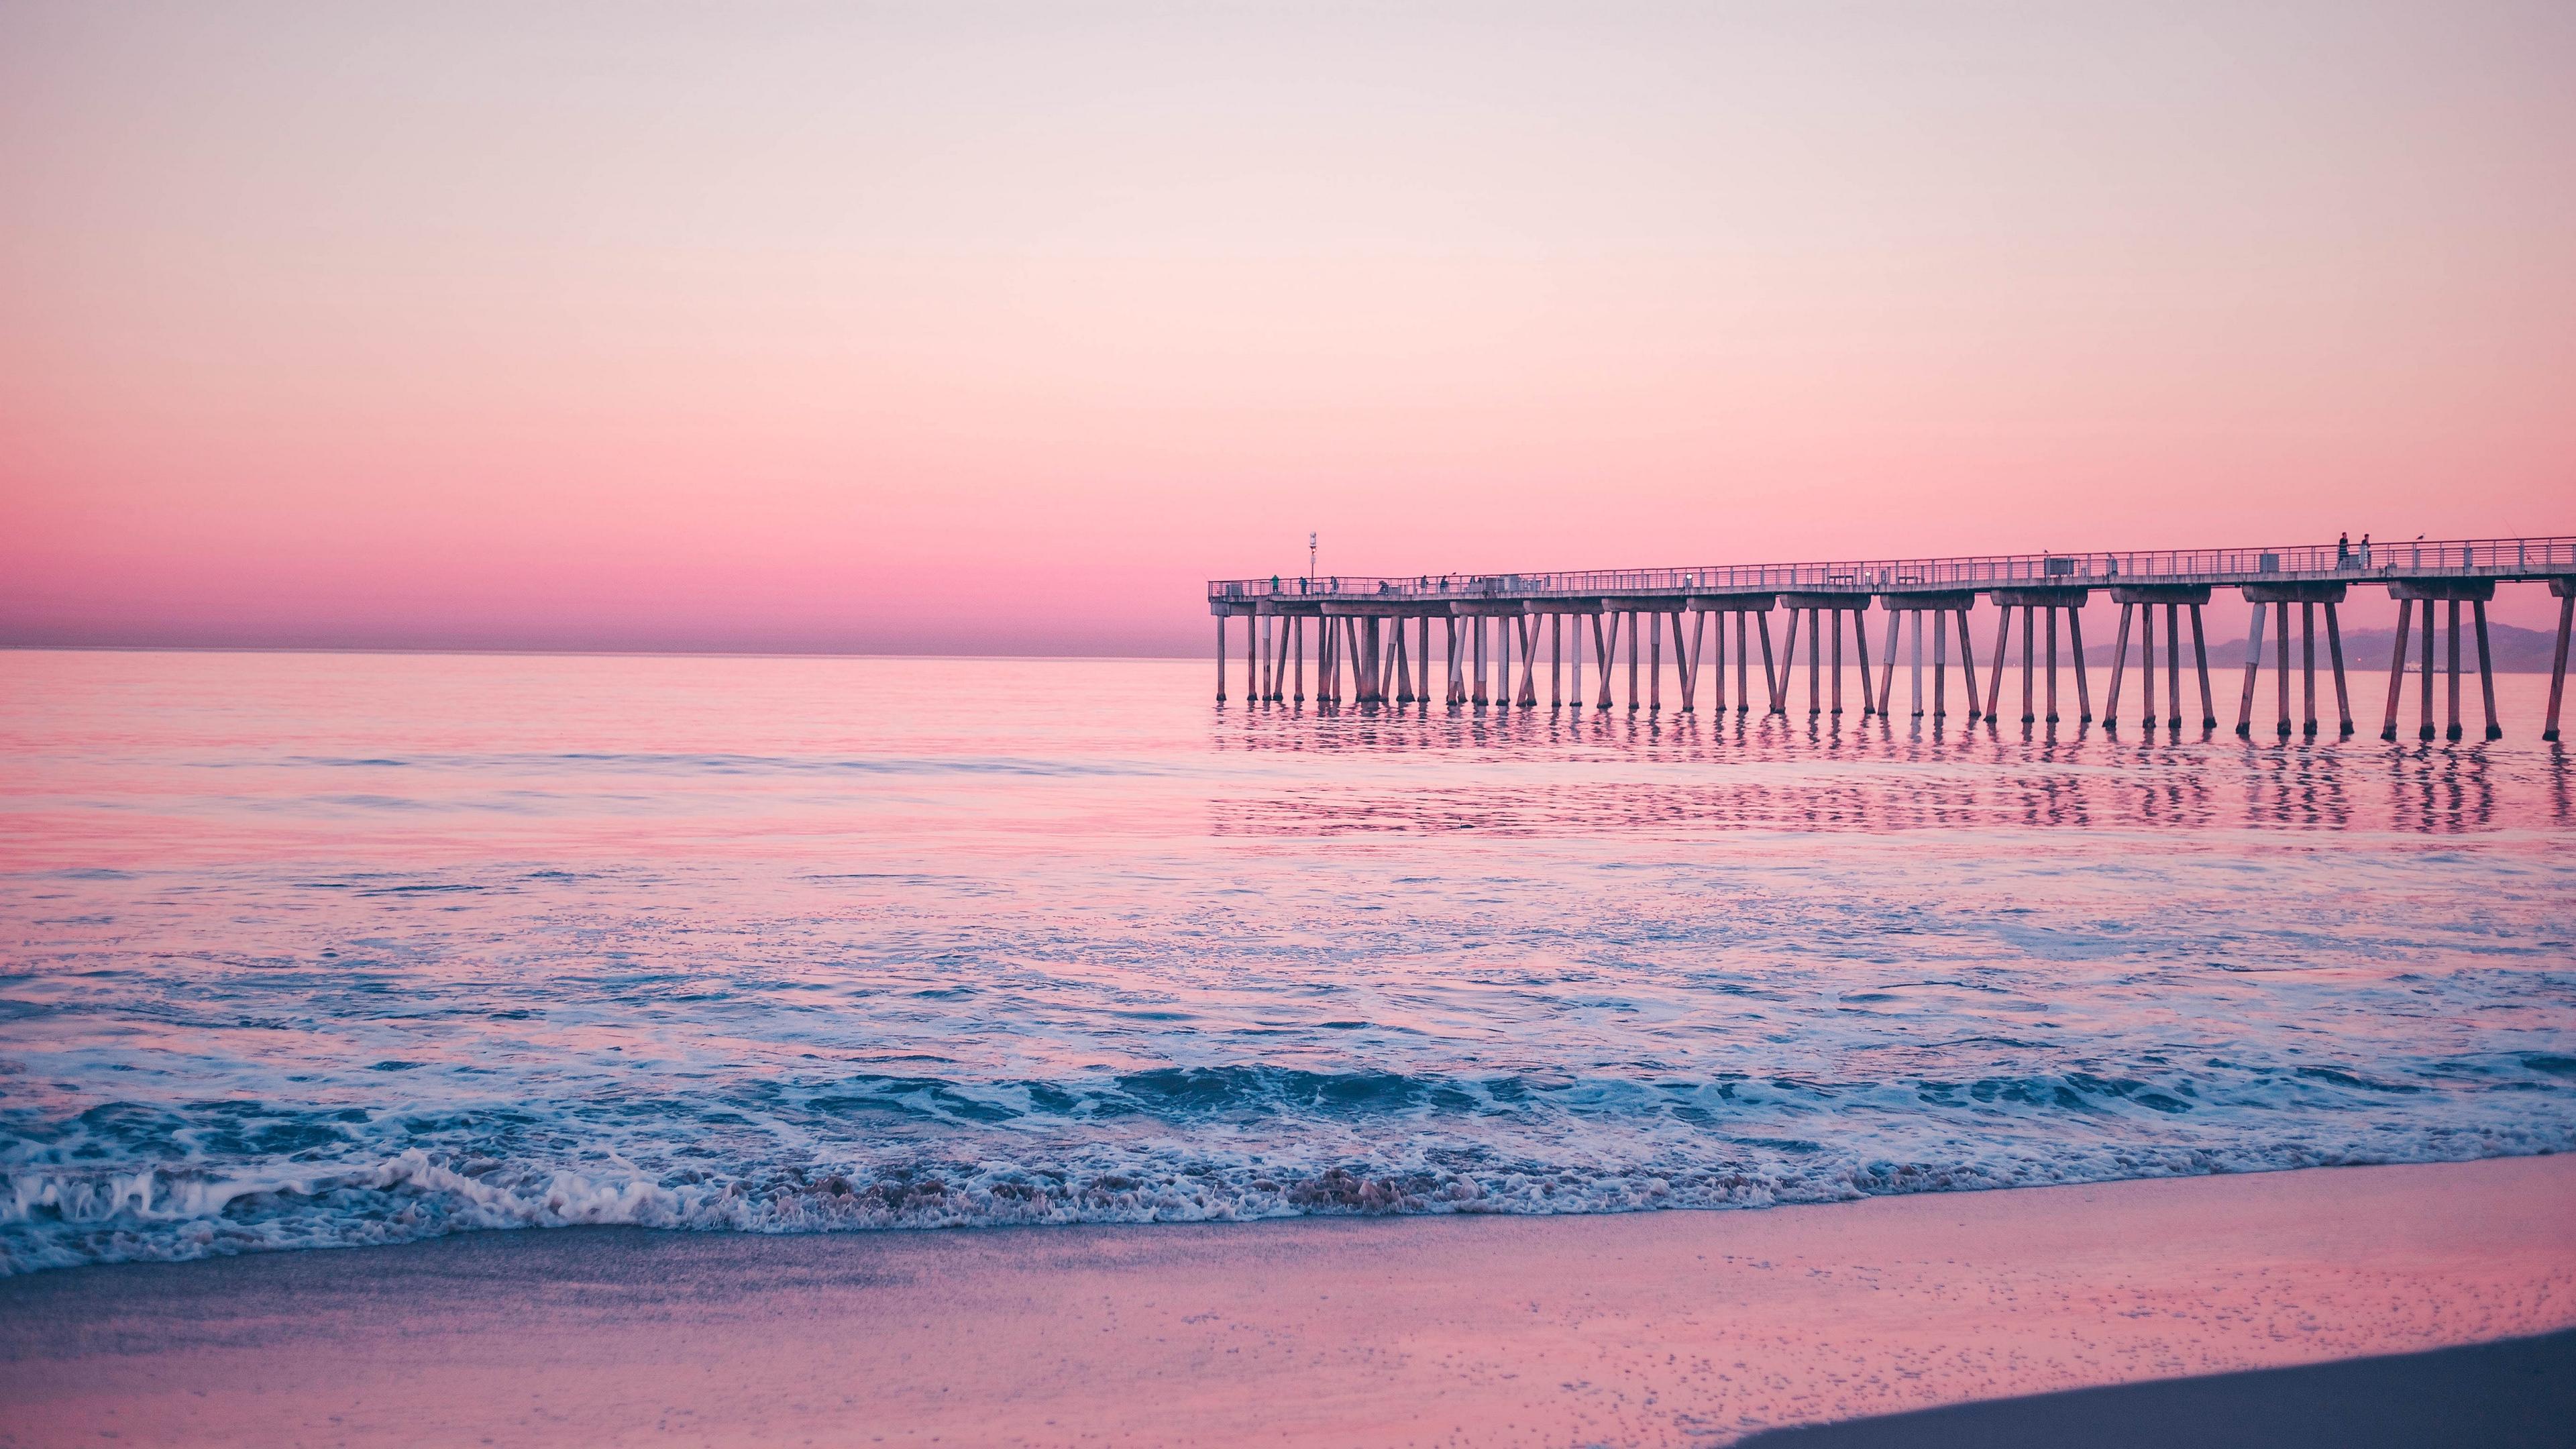 pier sea surf pink 4k 1541114647 - pier, sea, surf, pink 4k - surf, Sea, pier